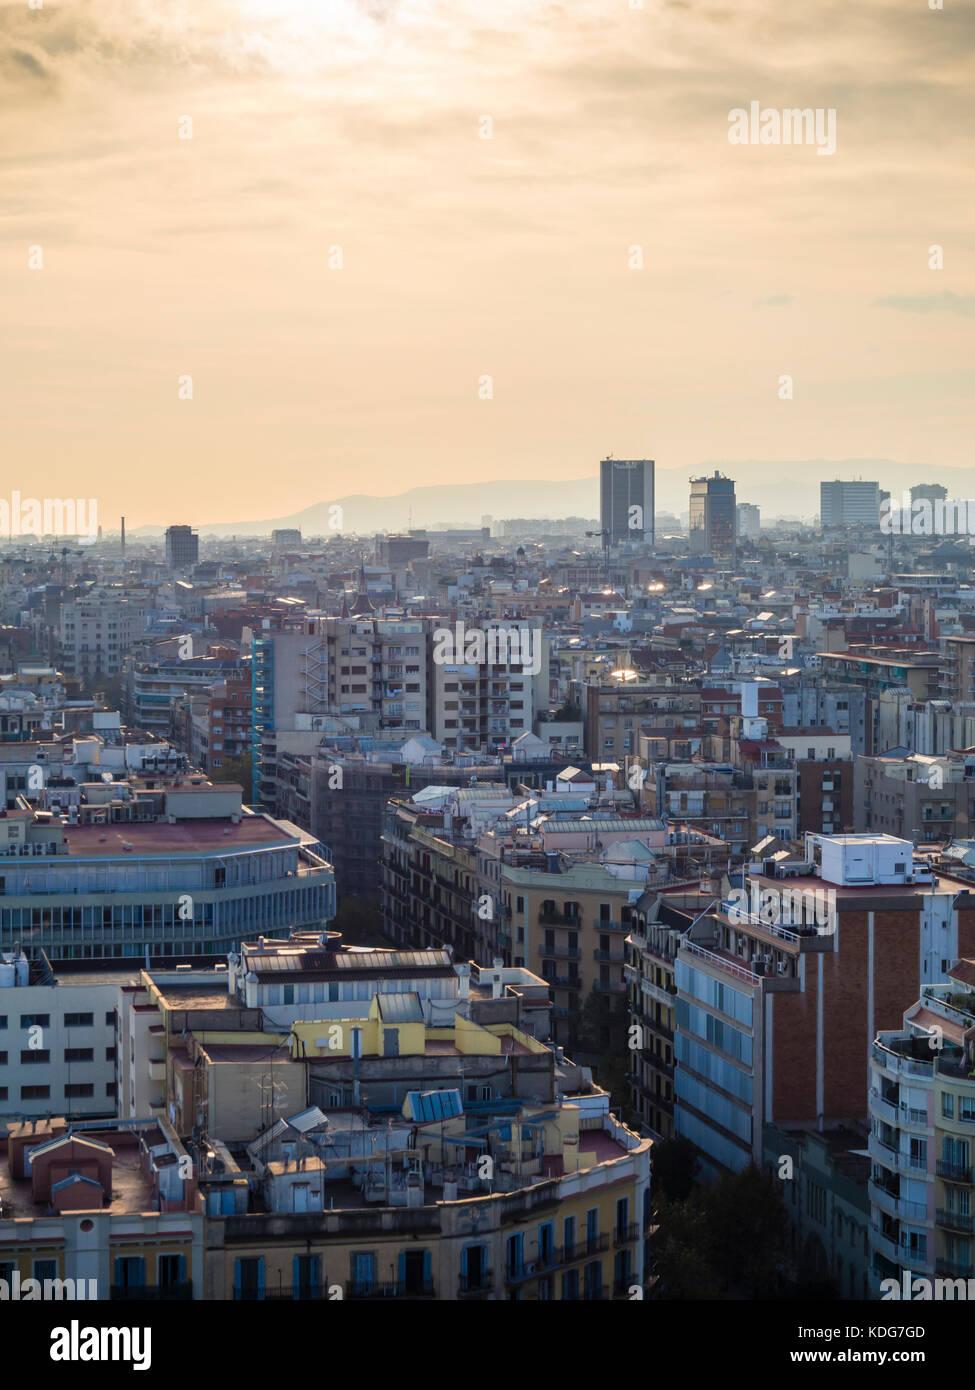 Barcelona, Spain - 11 Nov 2016: City view of Barcelona, Eixample district. - Stock Image